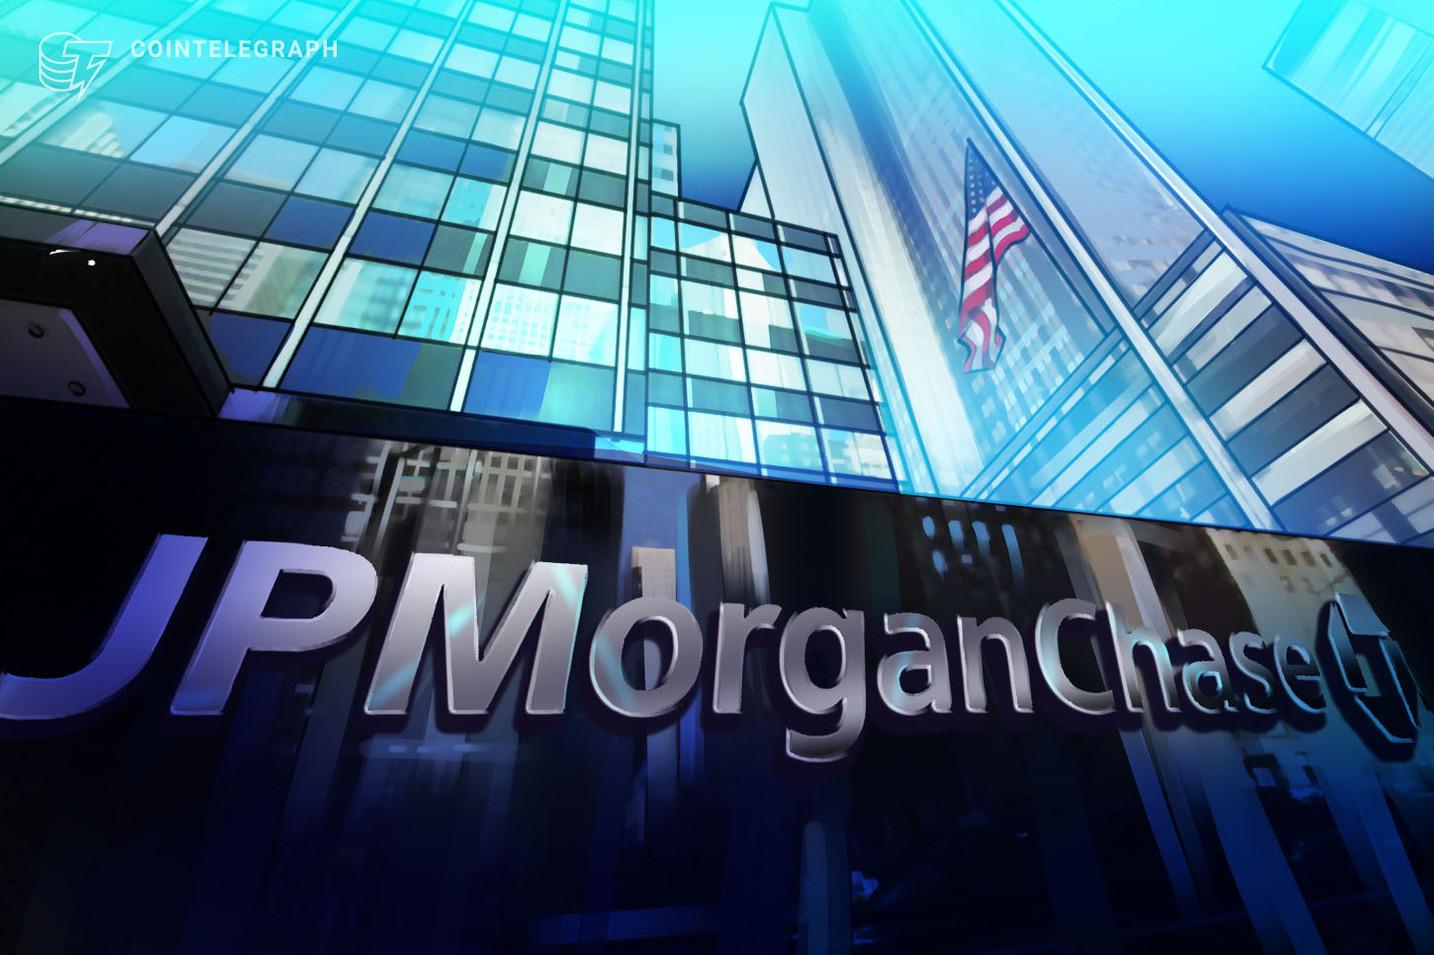 El Salvador's Bitcoin adoption may jeopardize IMF negotiations: JPMorgan